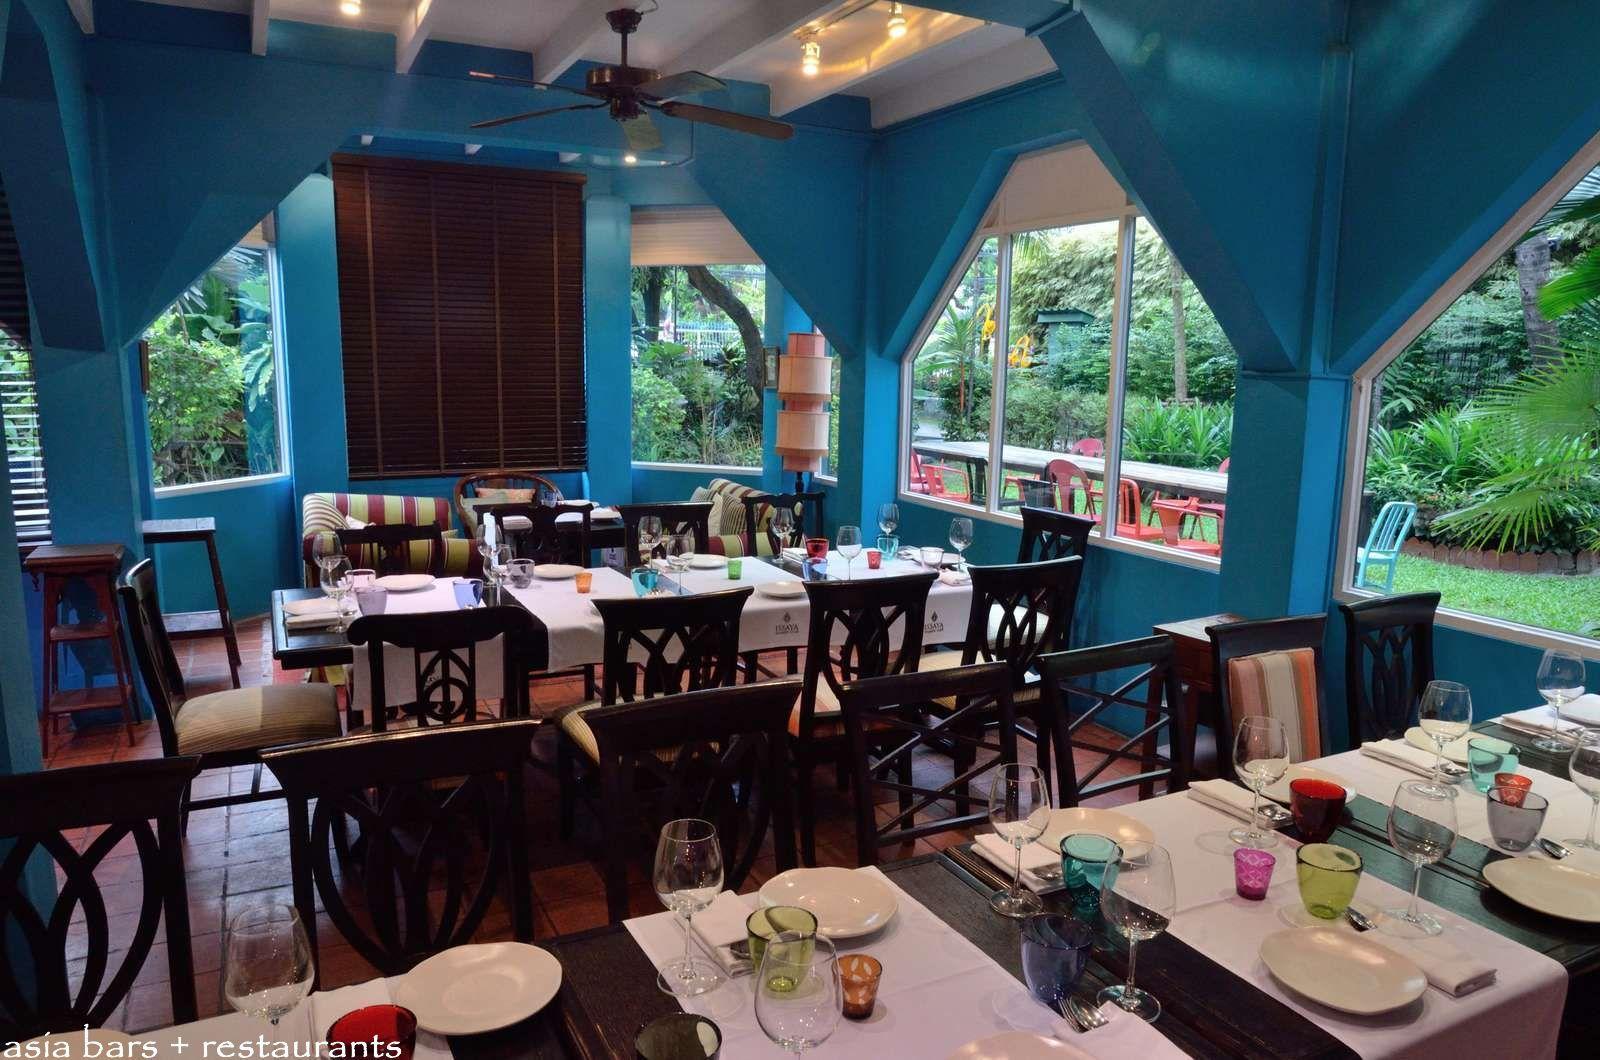 Blue Walls Terracotta Floors Google Search Restaurant Lounge Thai Restaurant Terracotta Floor